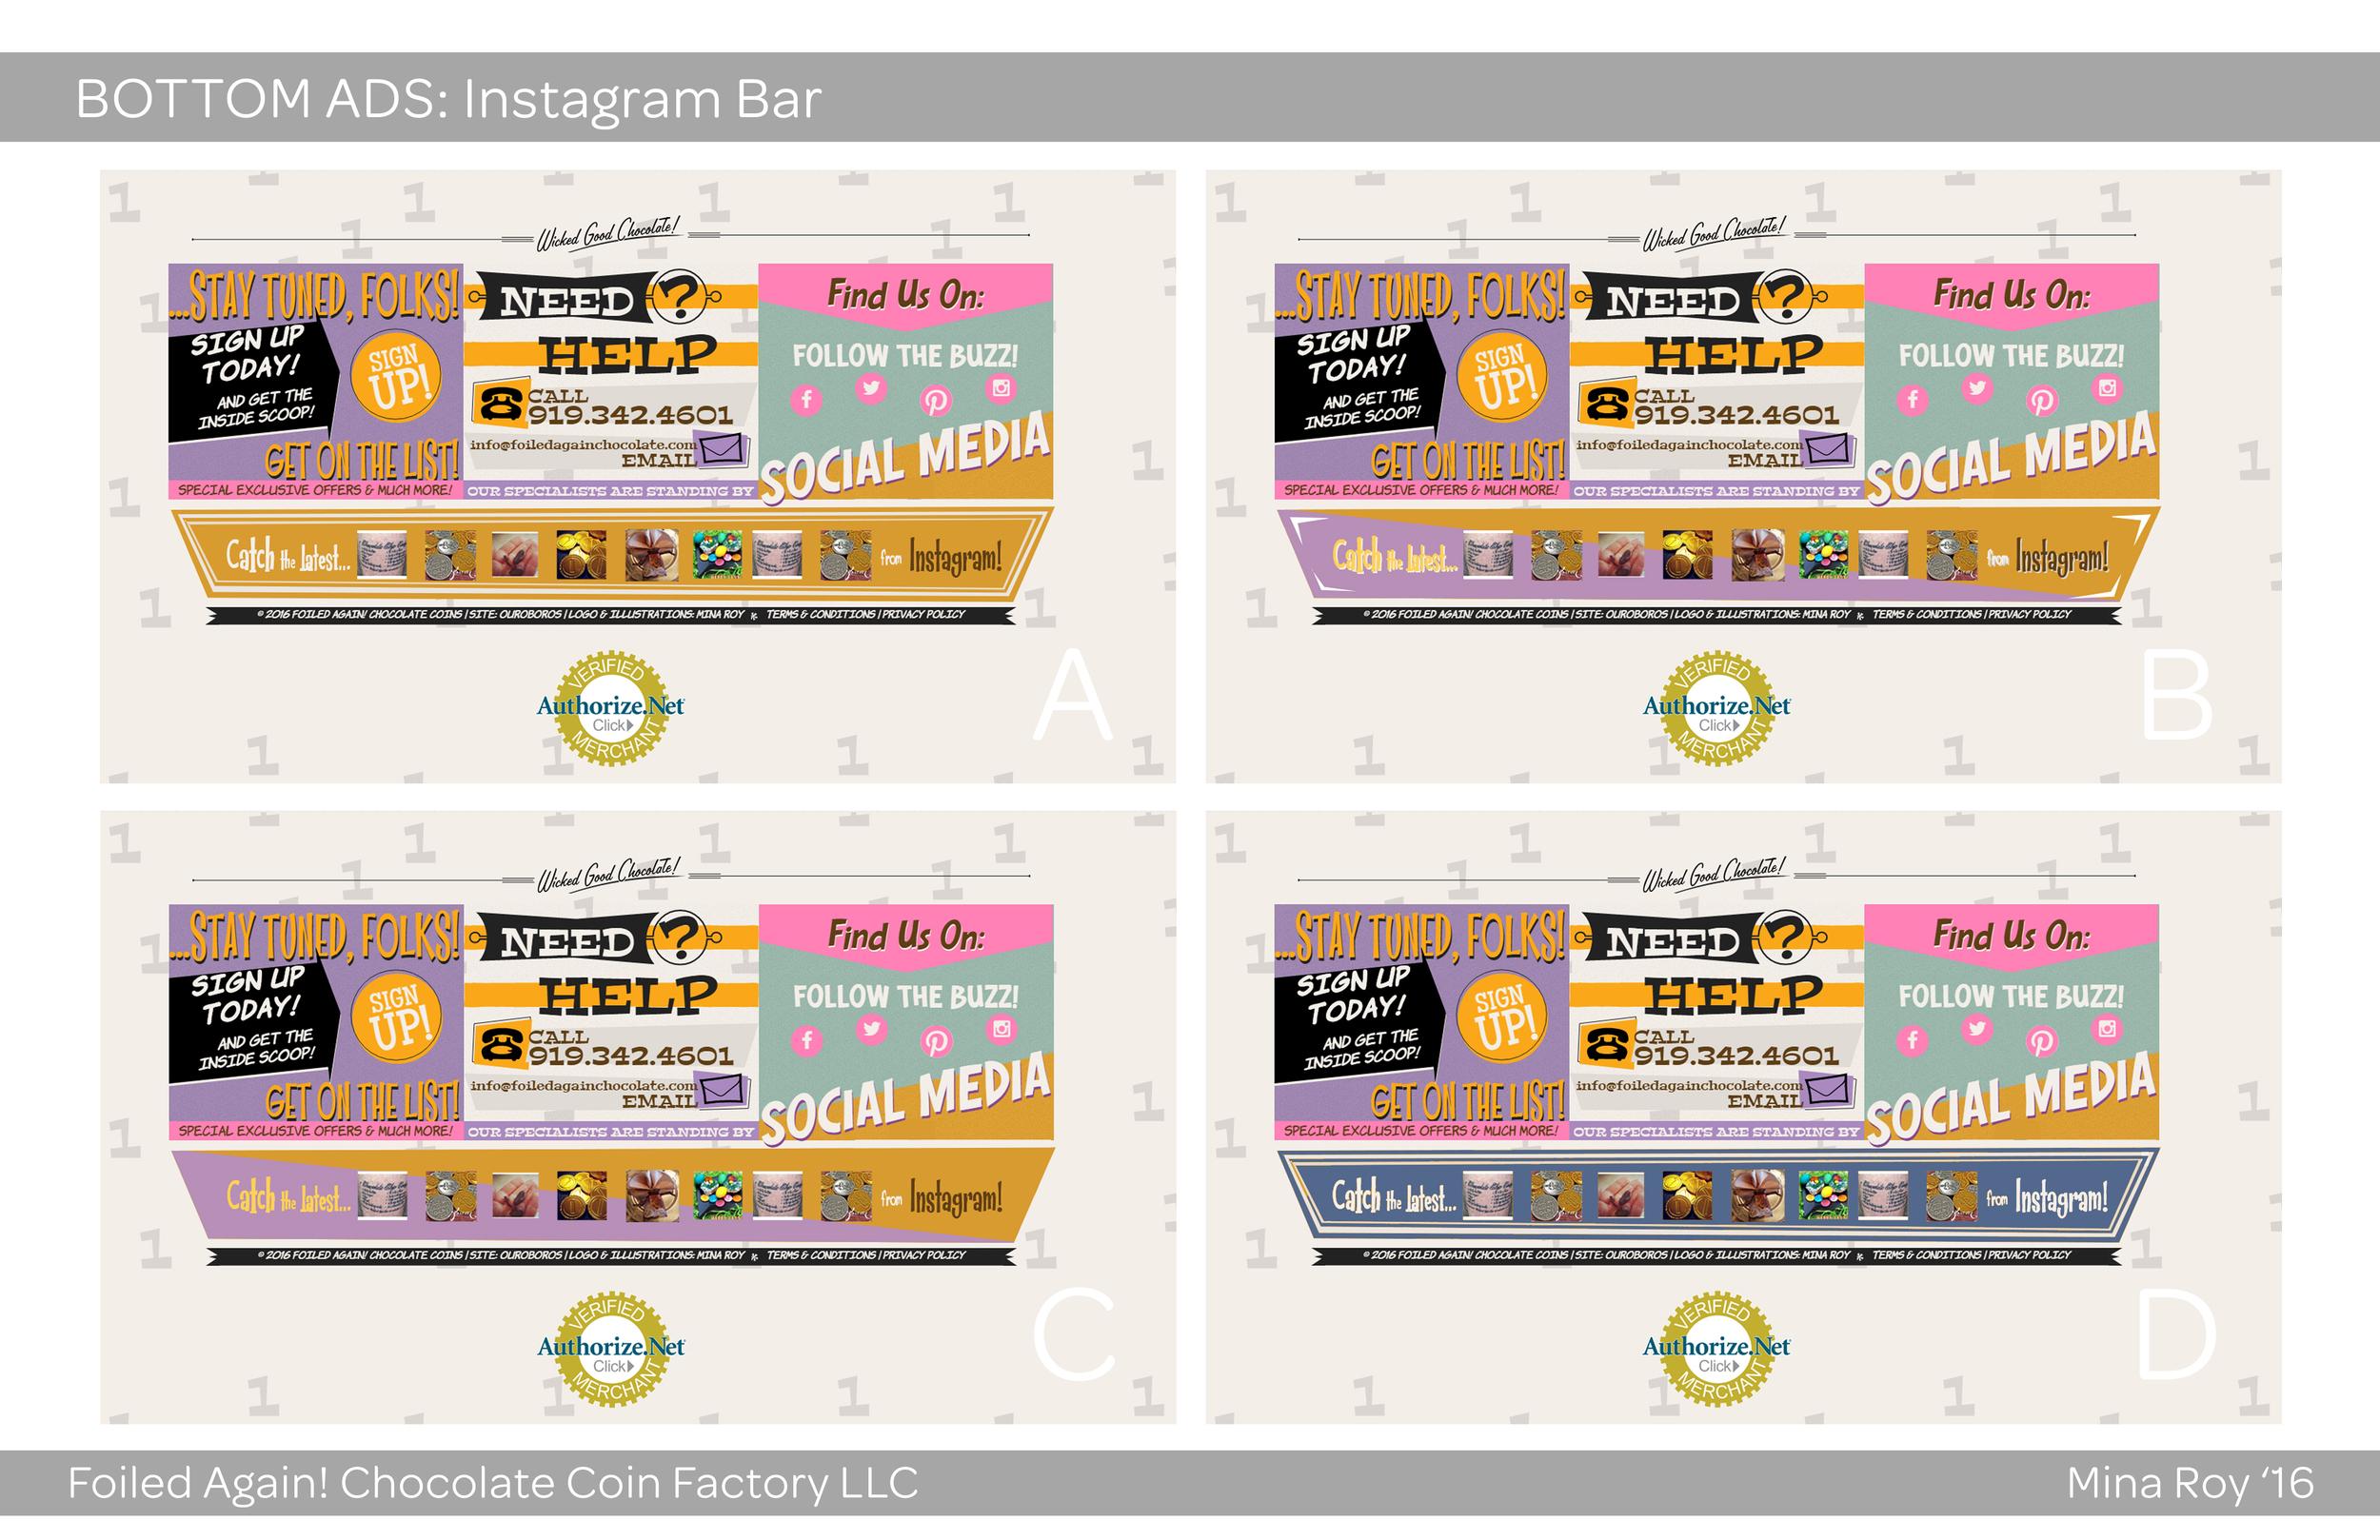 MinaRoy_FA_Website_BottomAds_Presentation.jpg